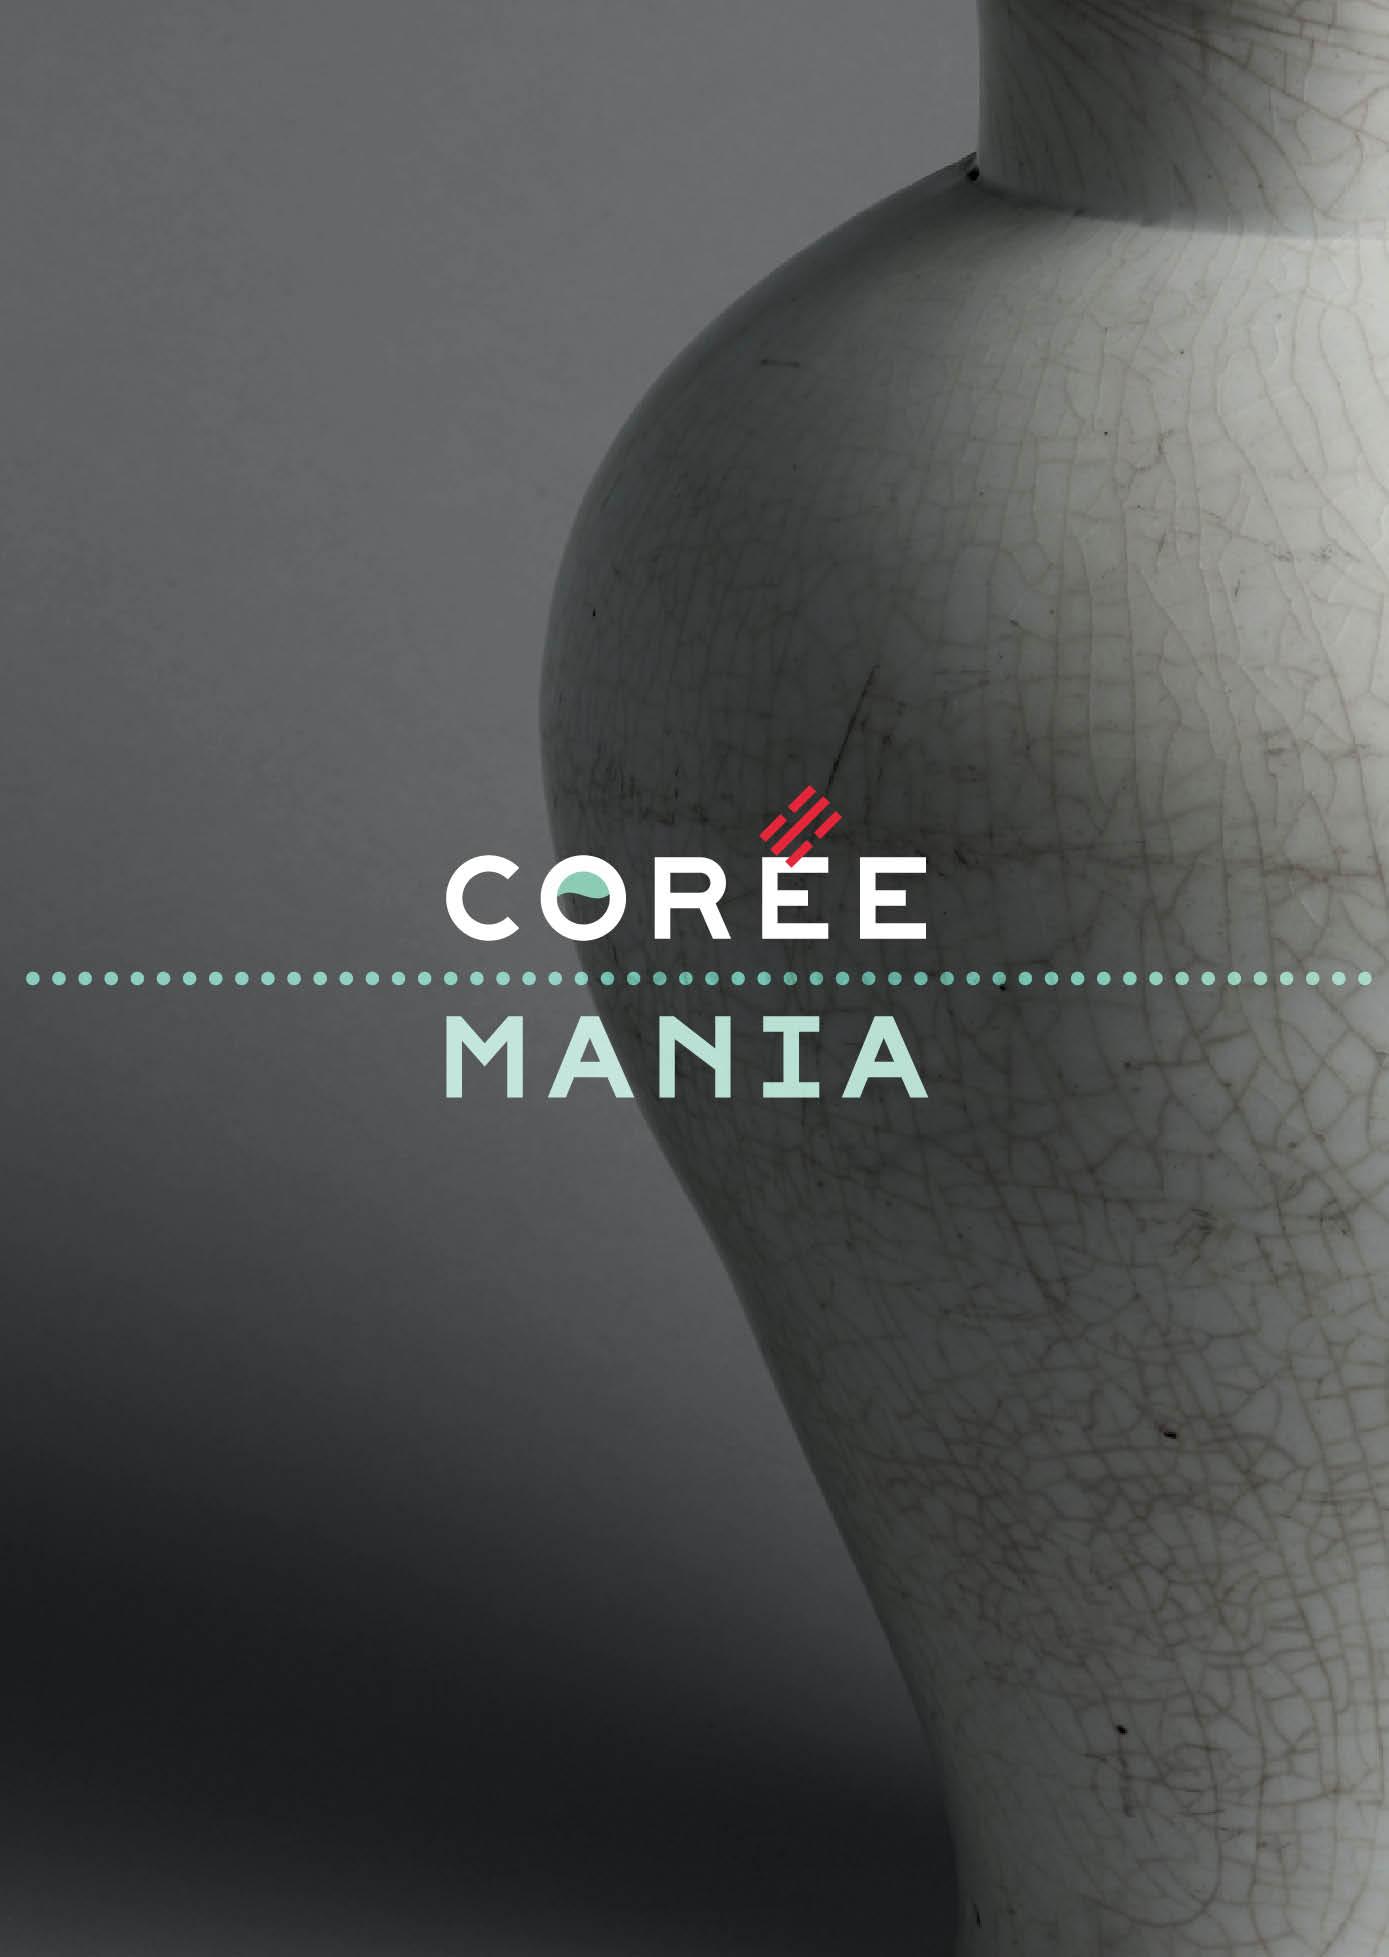 coree mania2